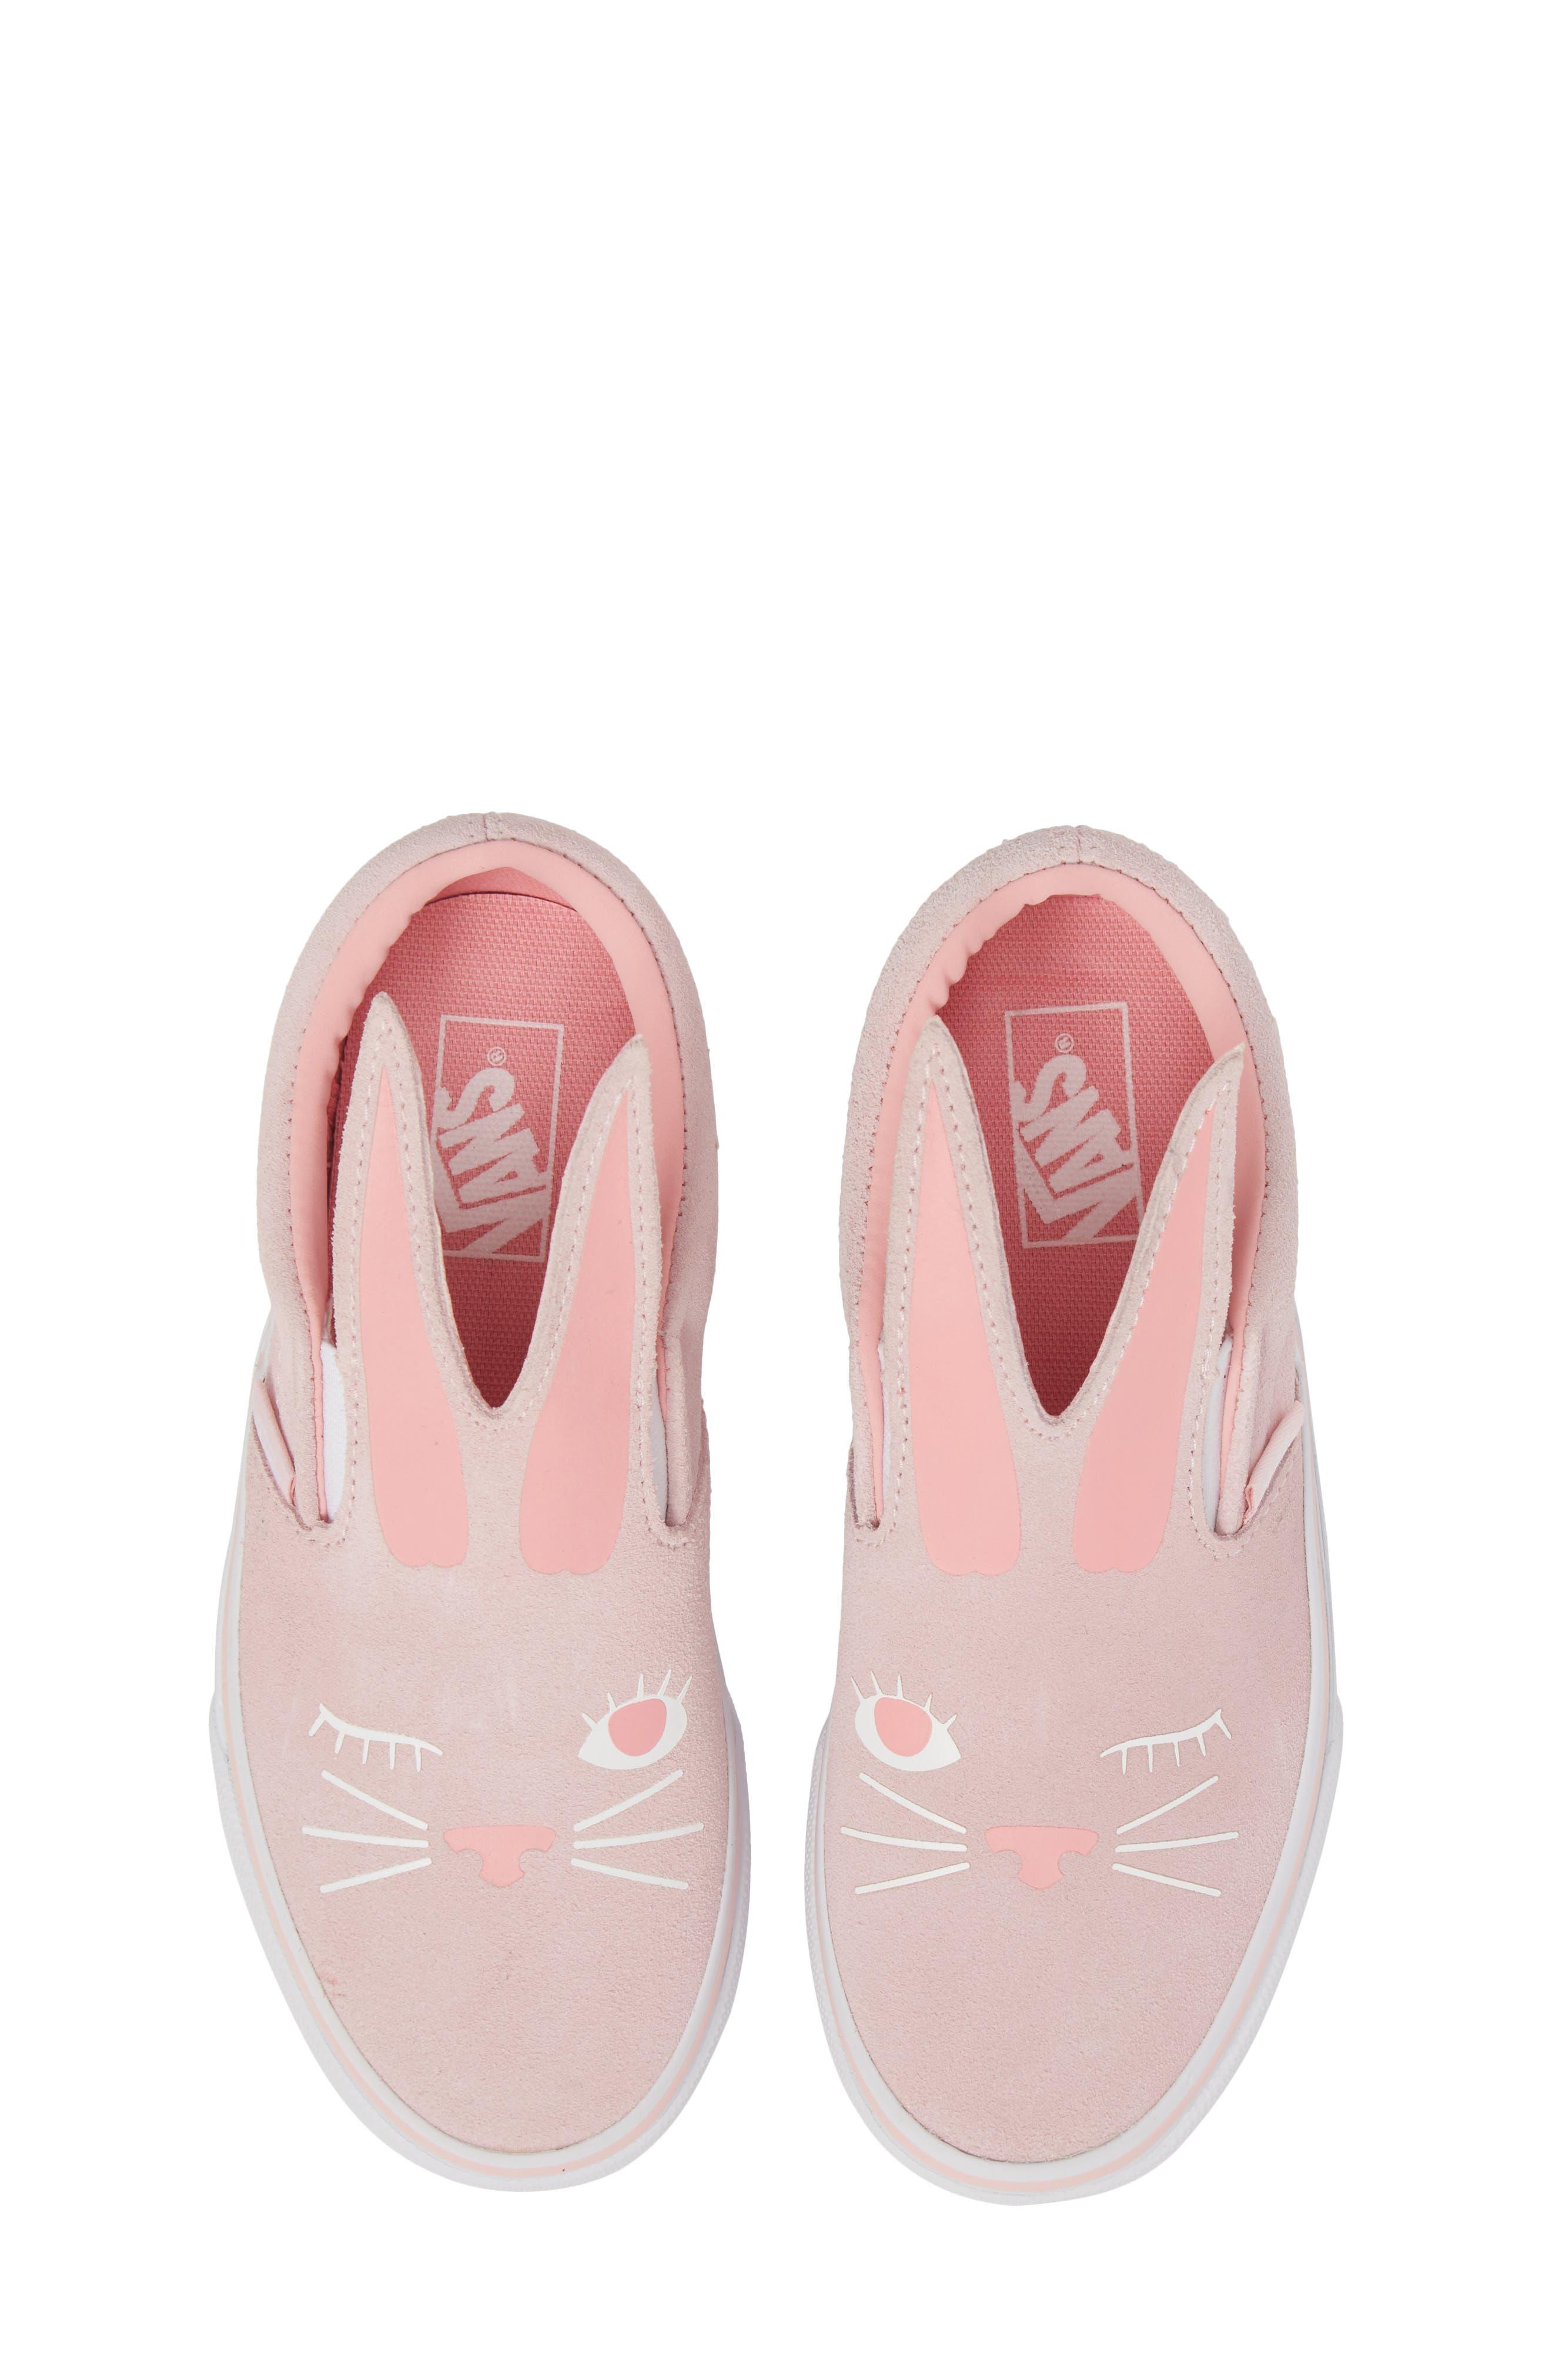 Slip-On Bunny Sneaker,                             Main thumbnail 1, color,                             Chalk Pink/ True White